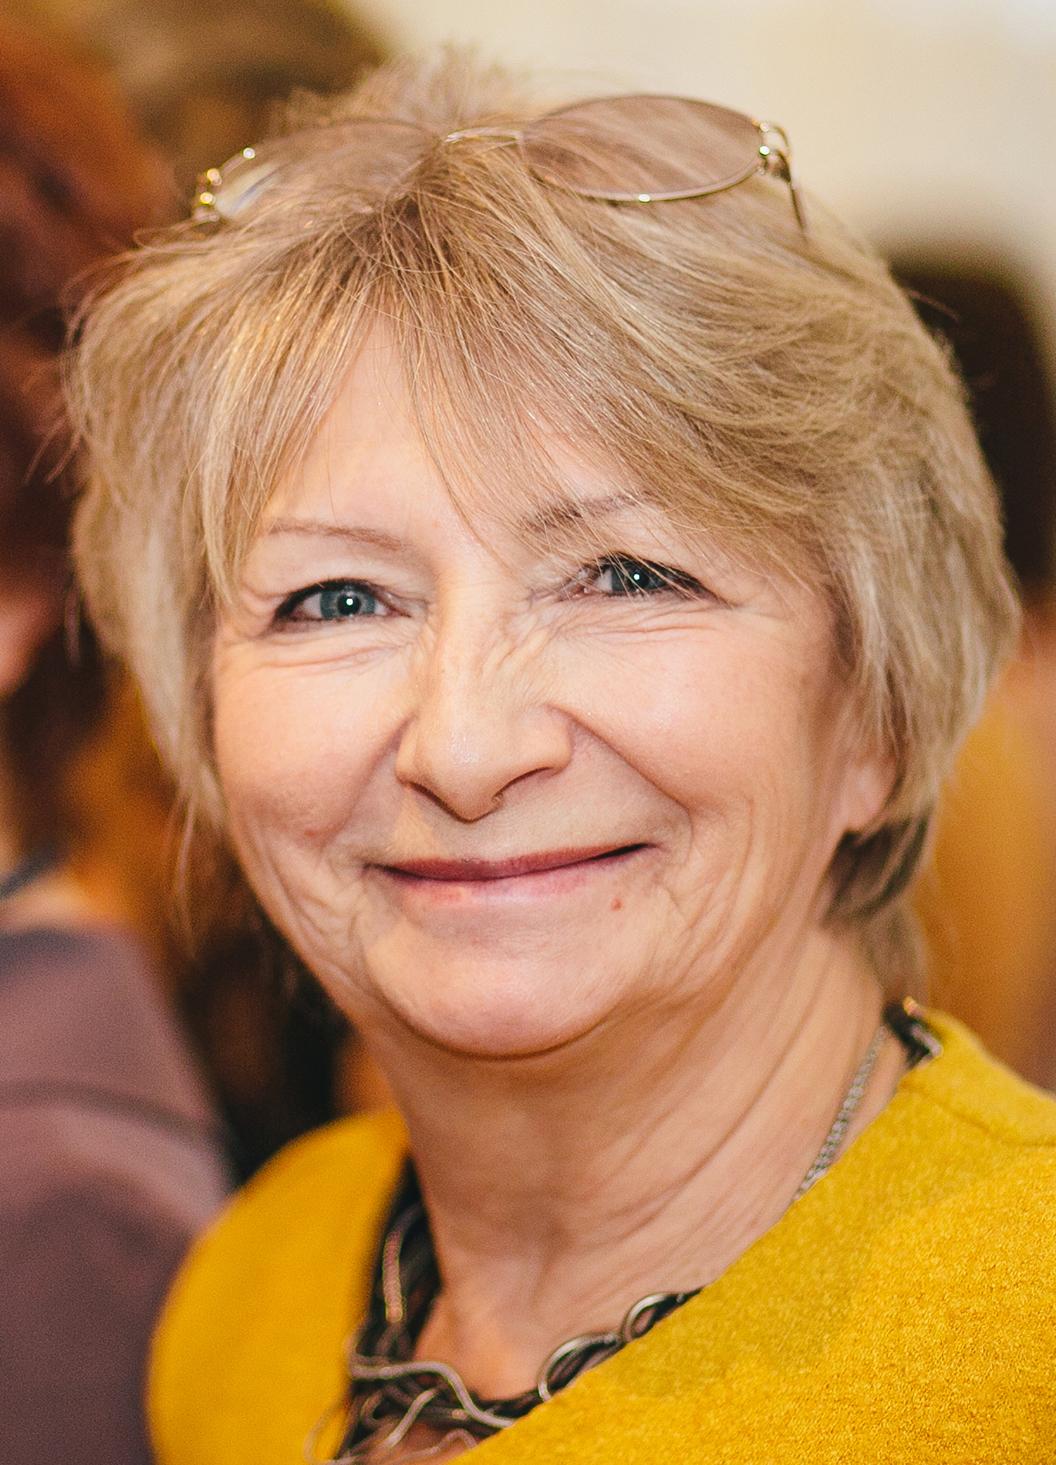 Левинская Наталия Сергеевна